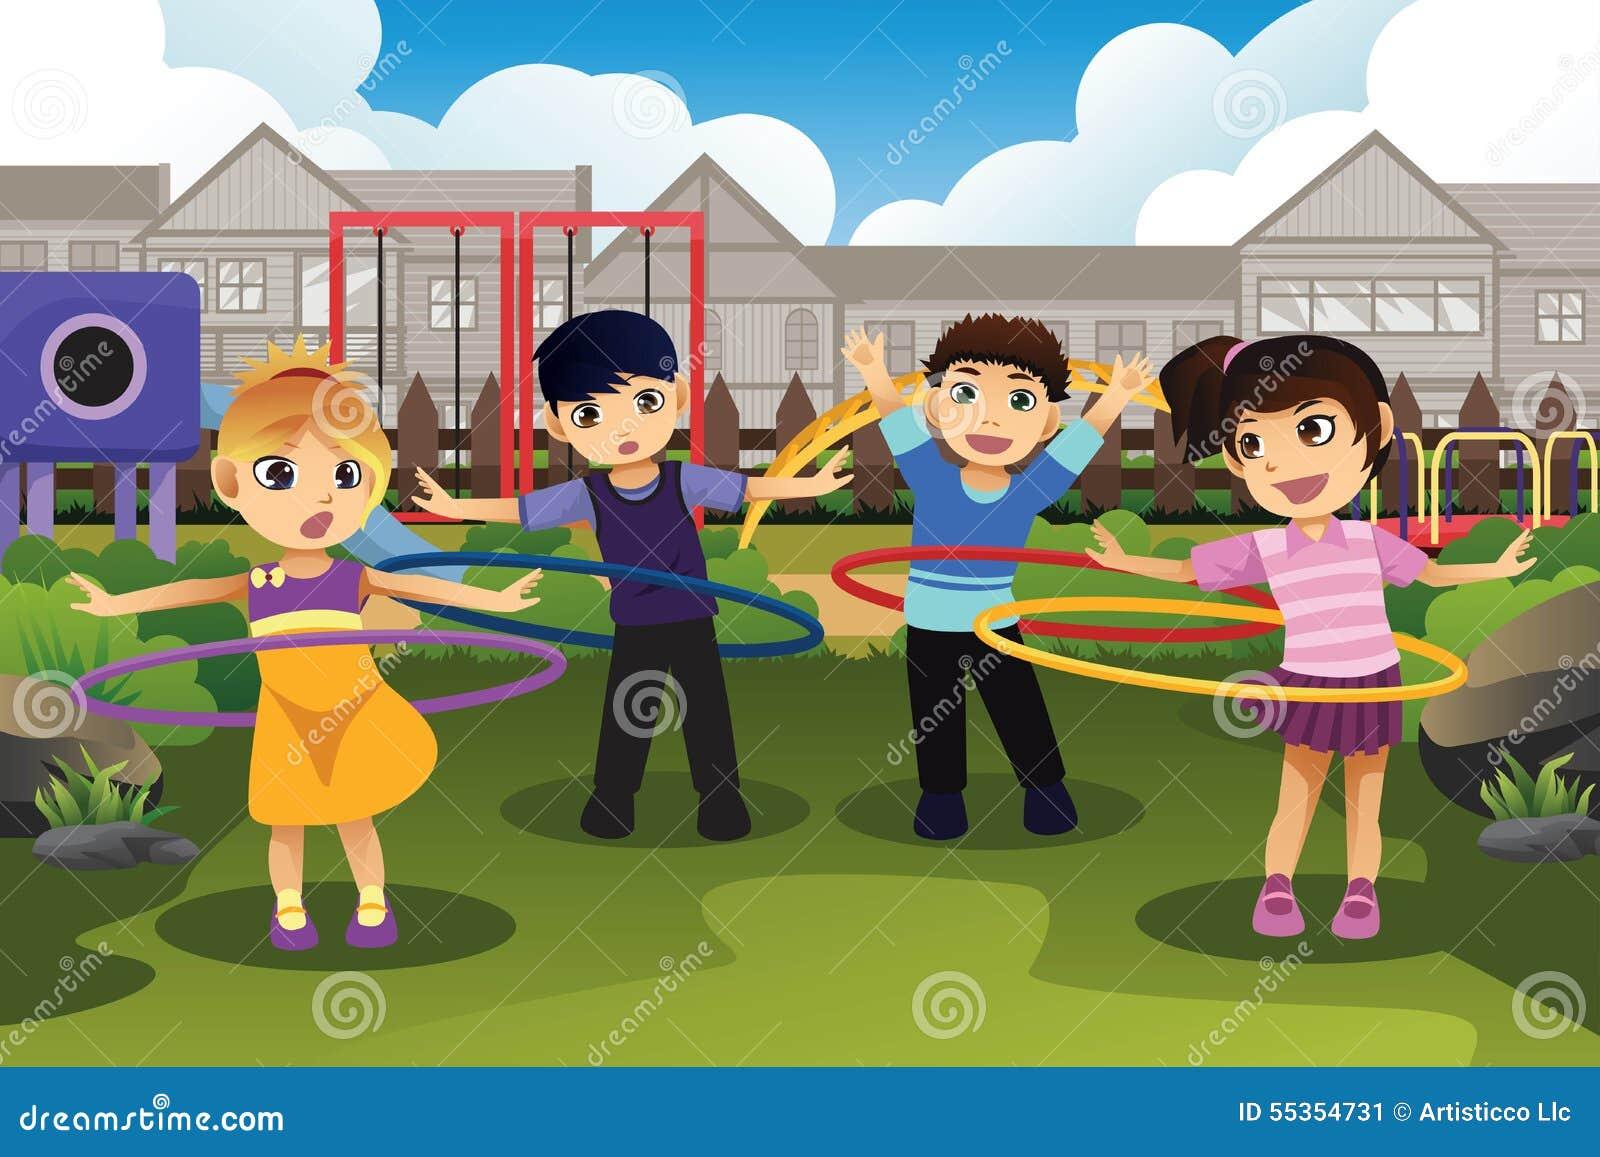 Bambini che giocano hula-hoop nel parco